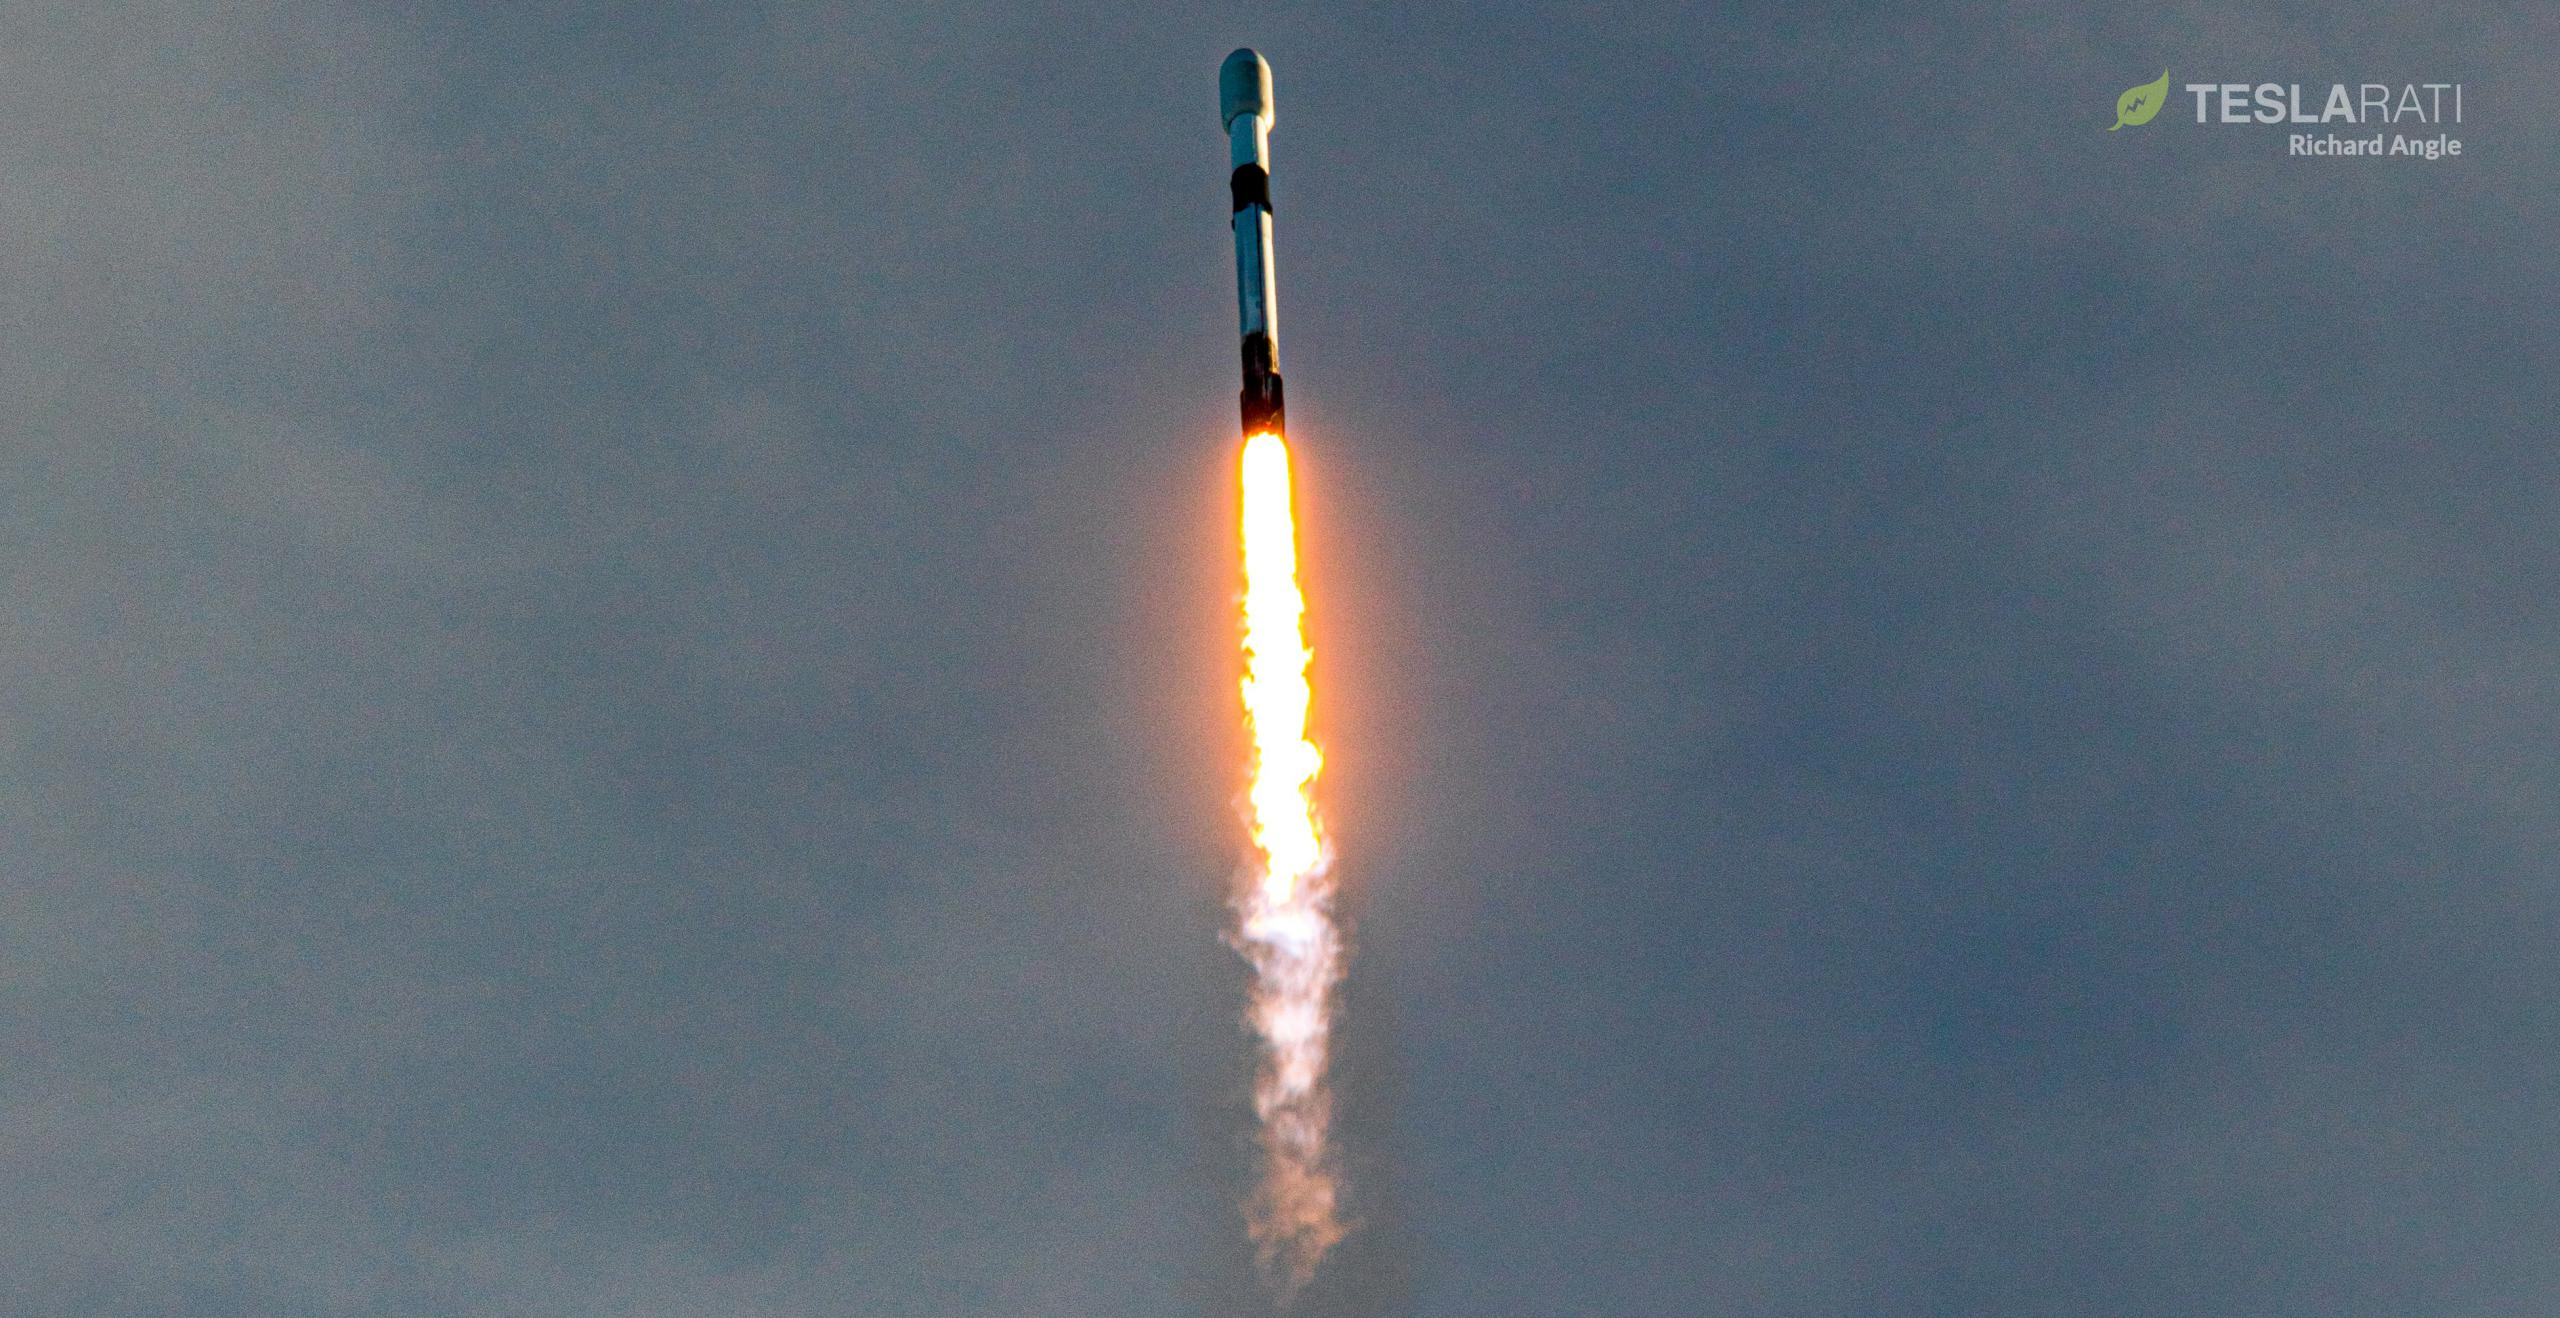 Starlink-16 Falcon 9 B1051 39A 012021 (Richard Angle) launch 1 crop (c)